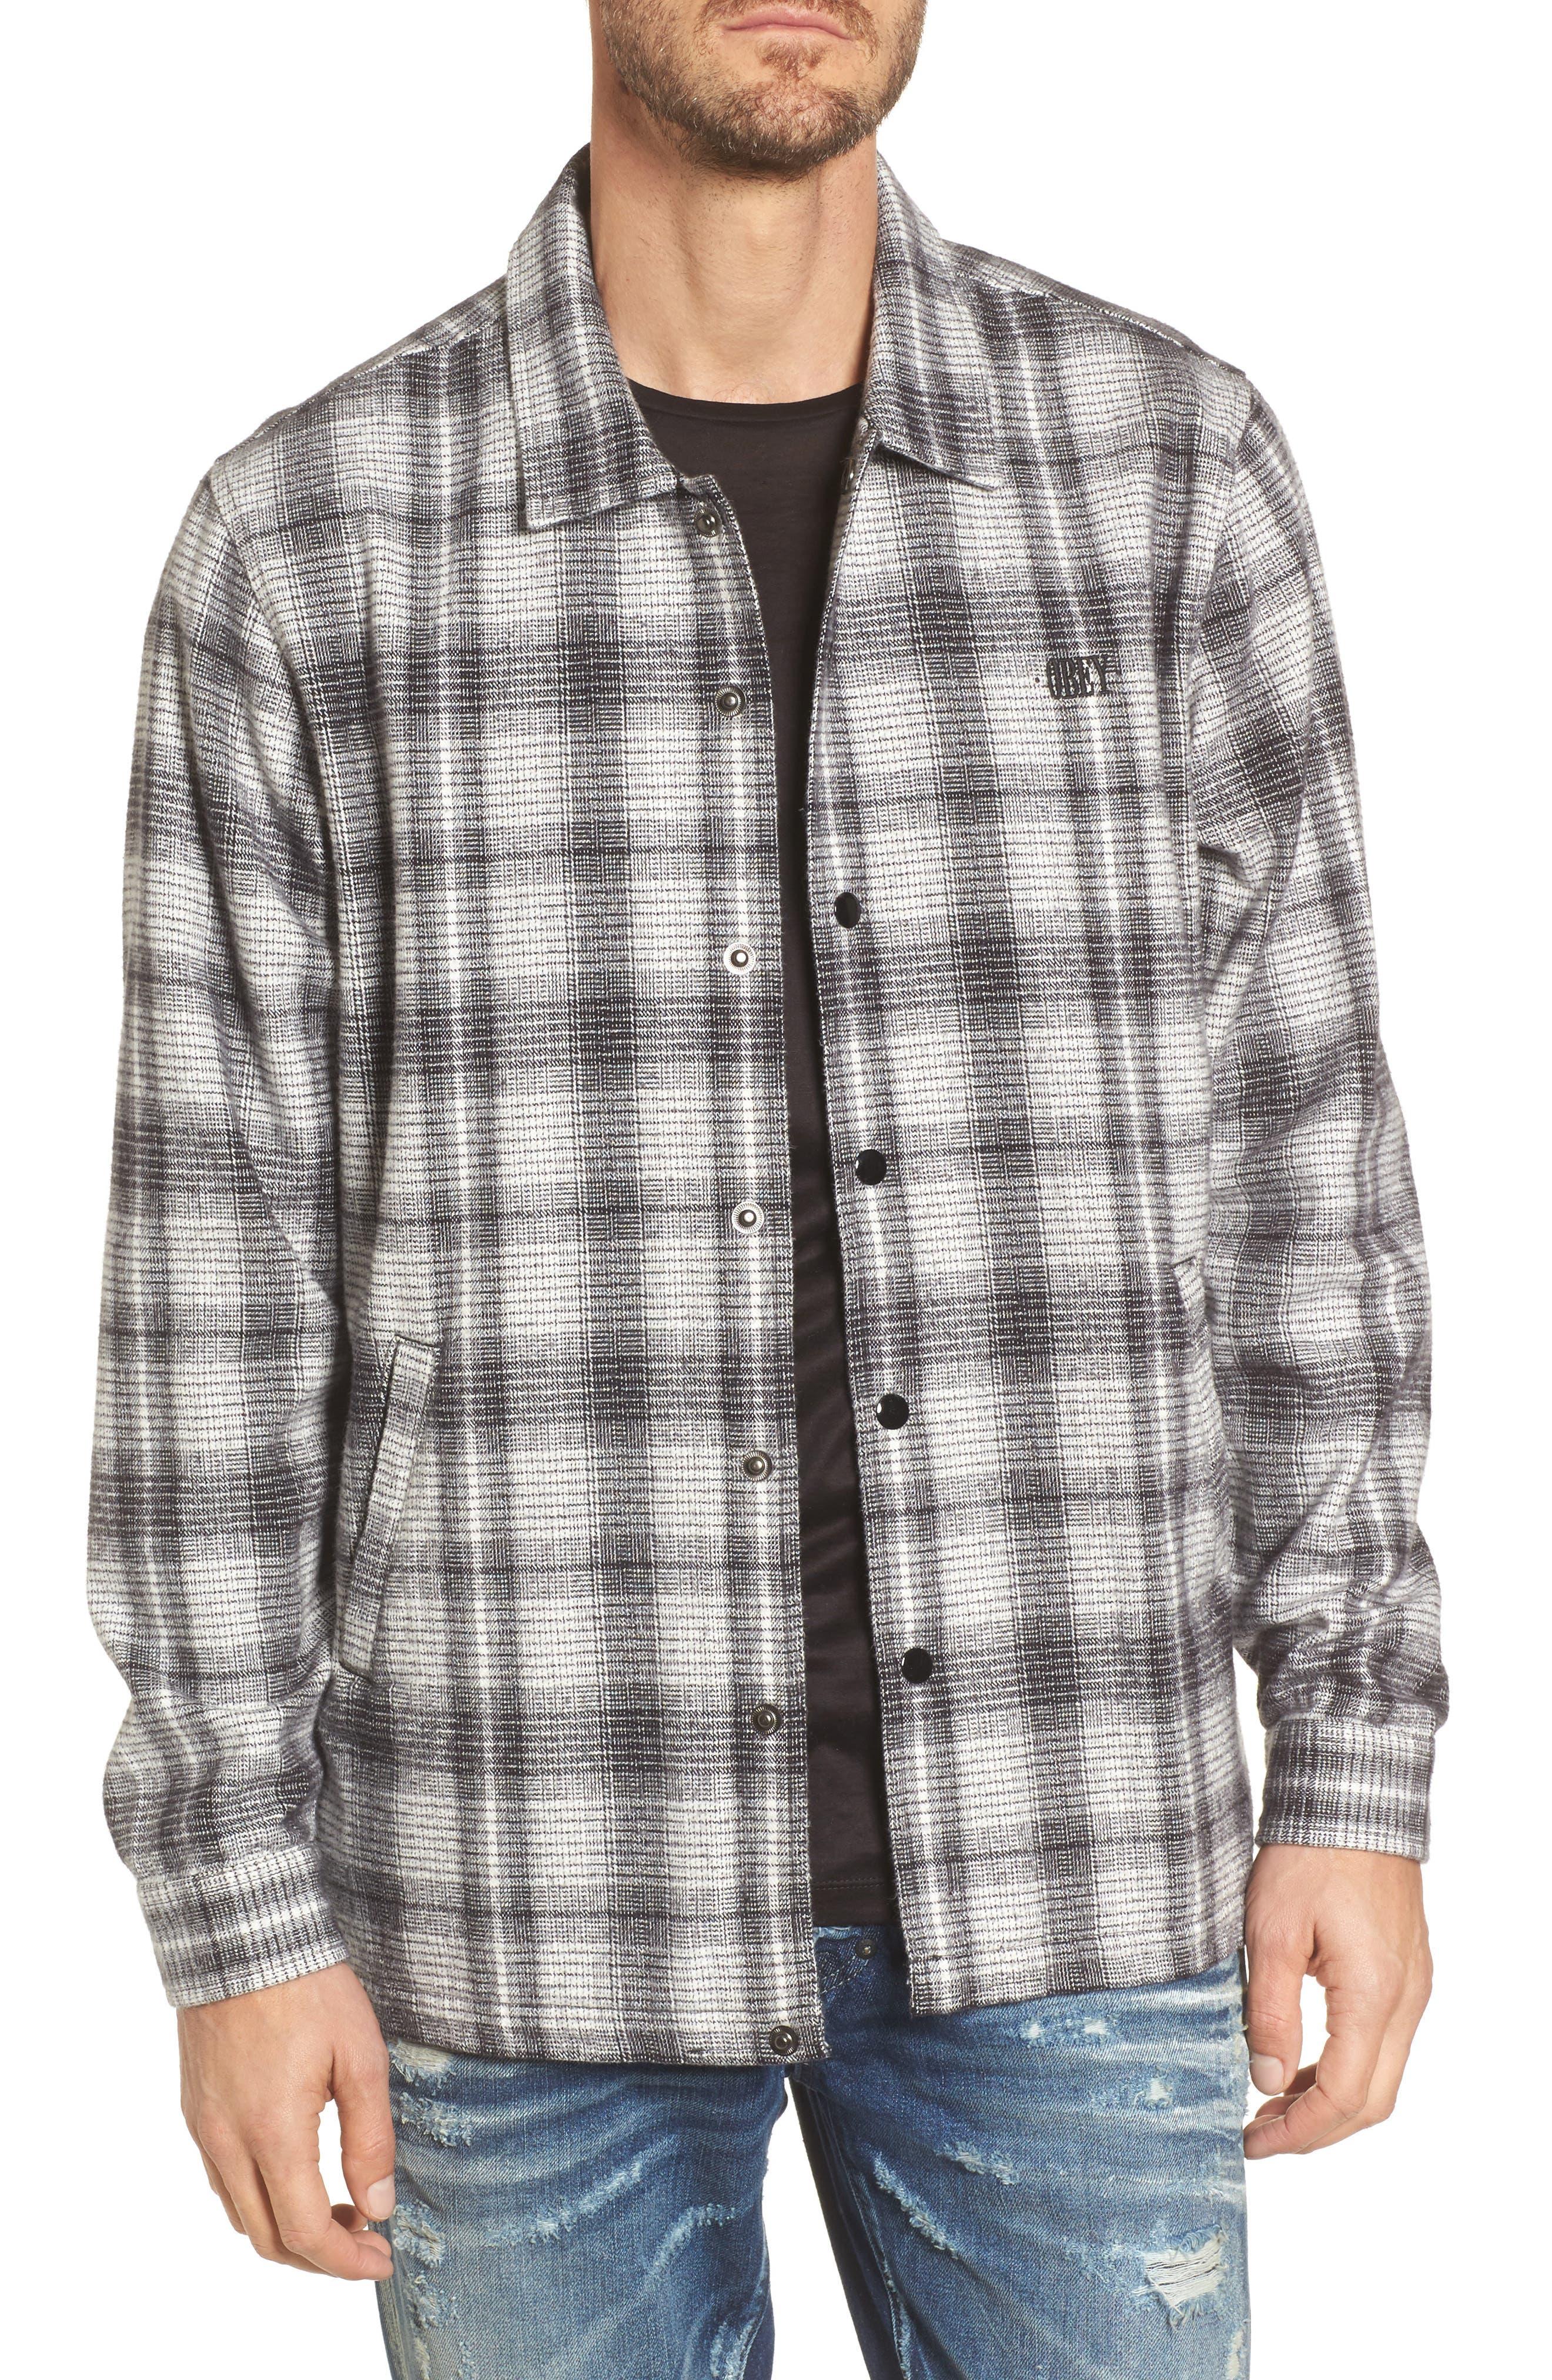 Whittier Plaid Flannel Shirt Jacket,                             Main thumbnail 1, color,                             Neutral Grey Multi